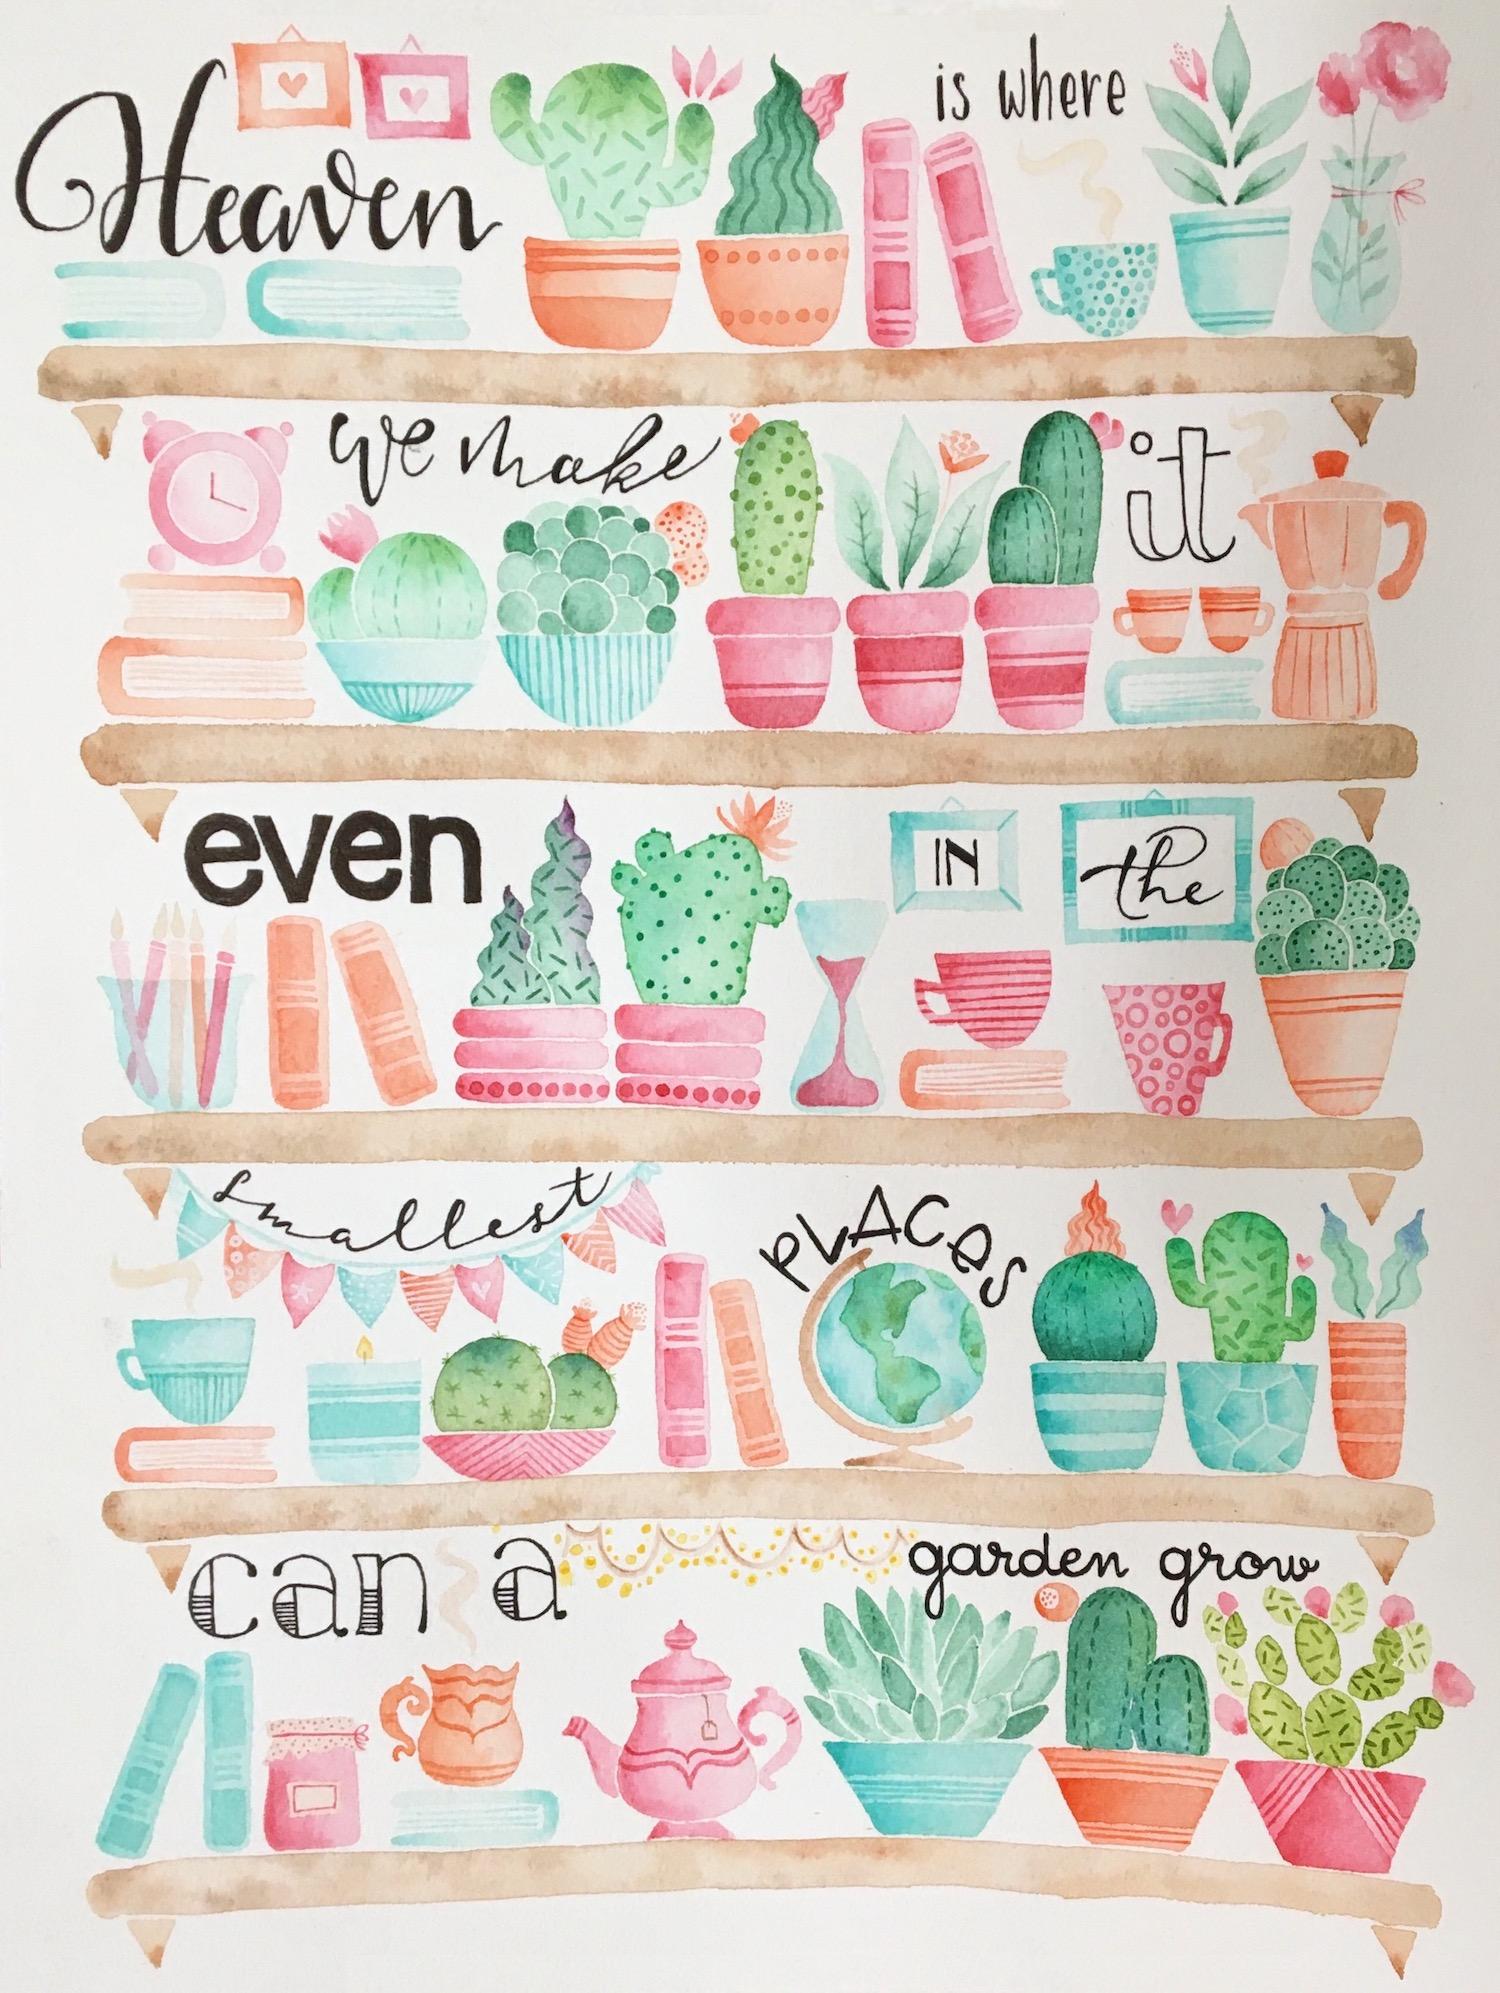 Heaven is where we make it even in the smallest places can a garden grow - Dispacci da San Francisco - Viachesiva